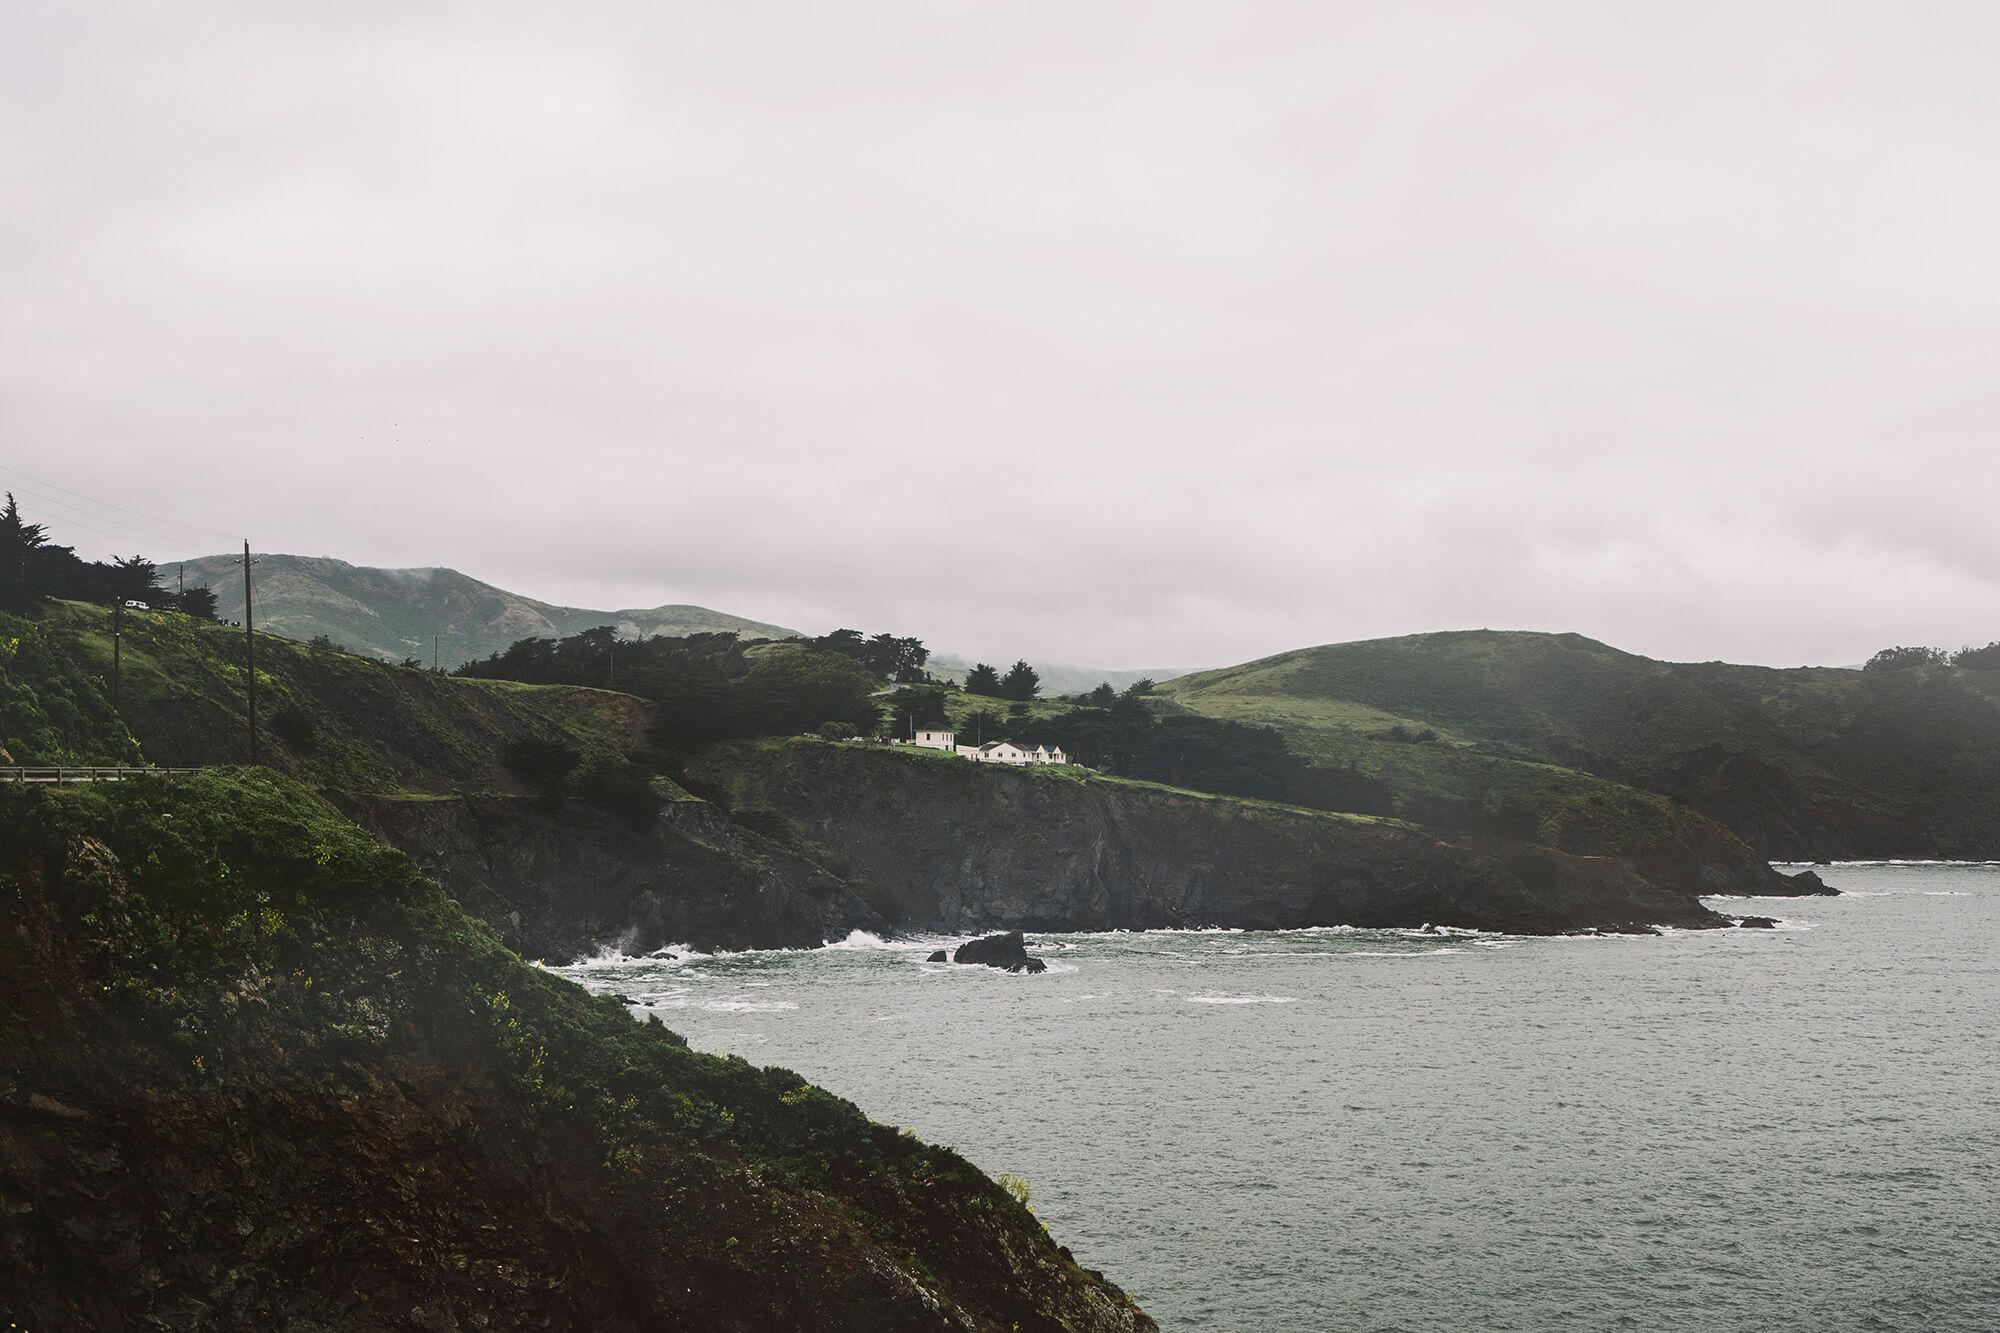 Point Bonita, San Francisco